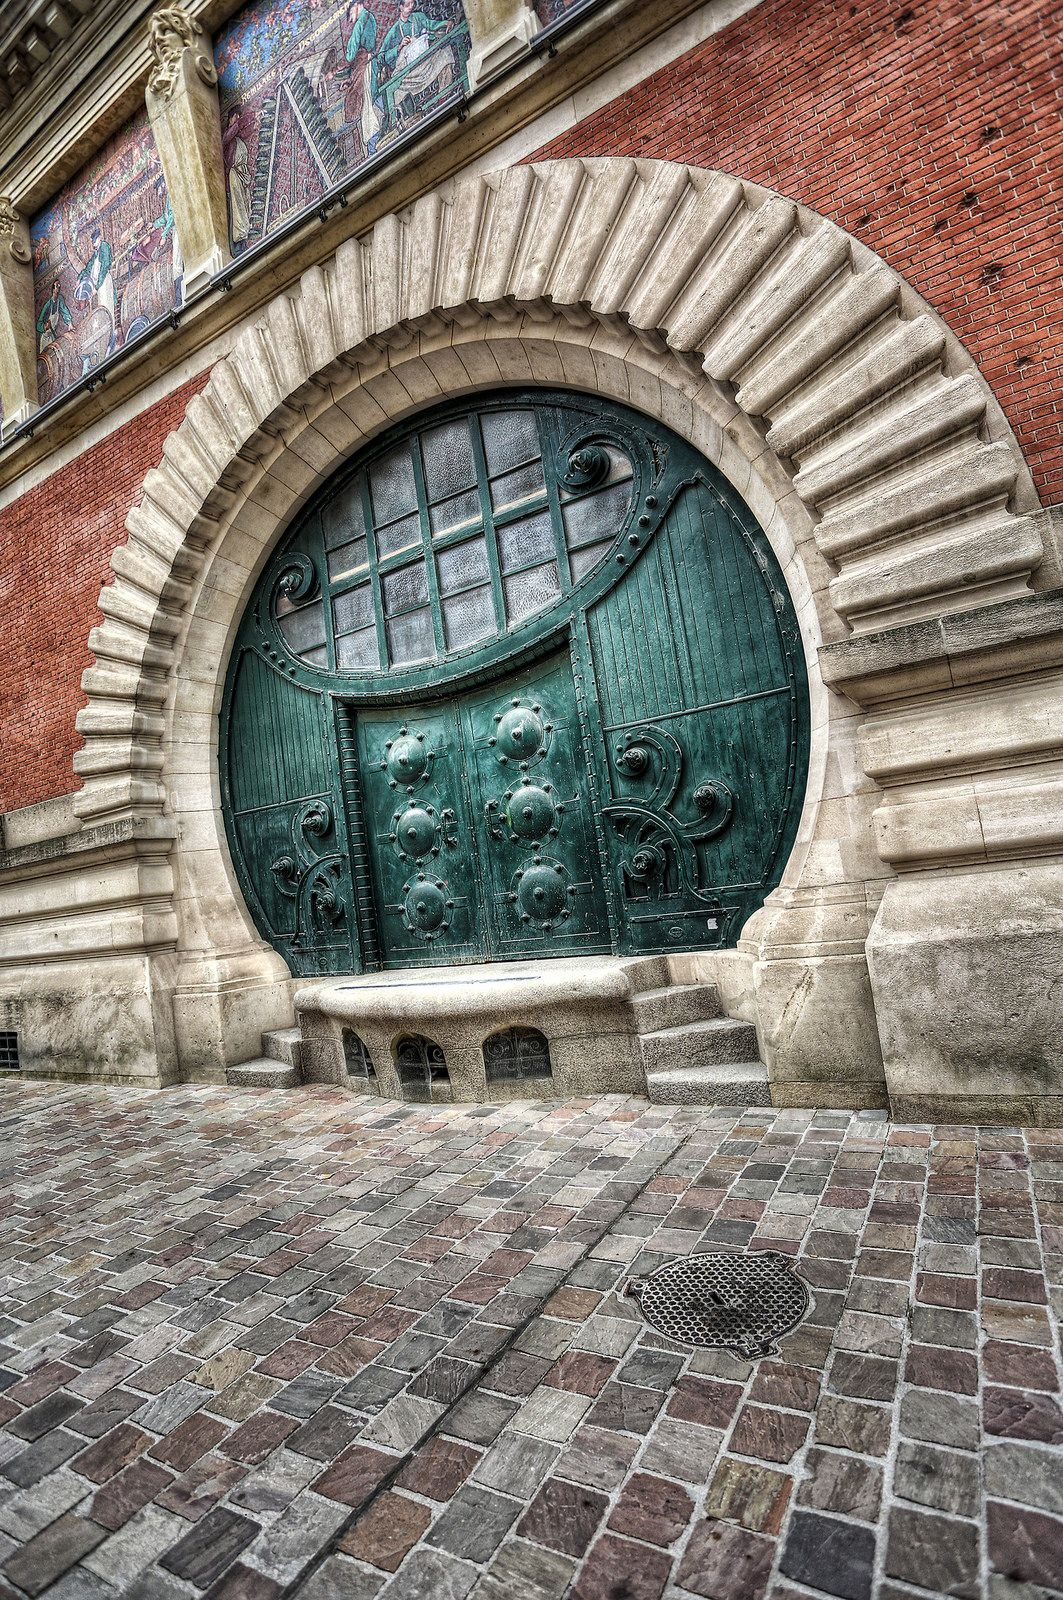 Decorating circular door images : Stunning circular door <3 | ❥ Doors and Windows ❥ | Pinterest ...